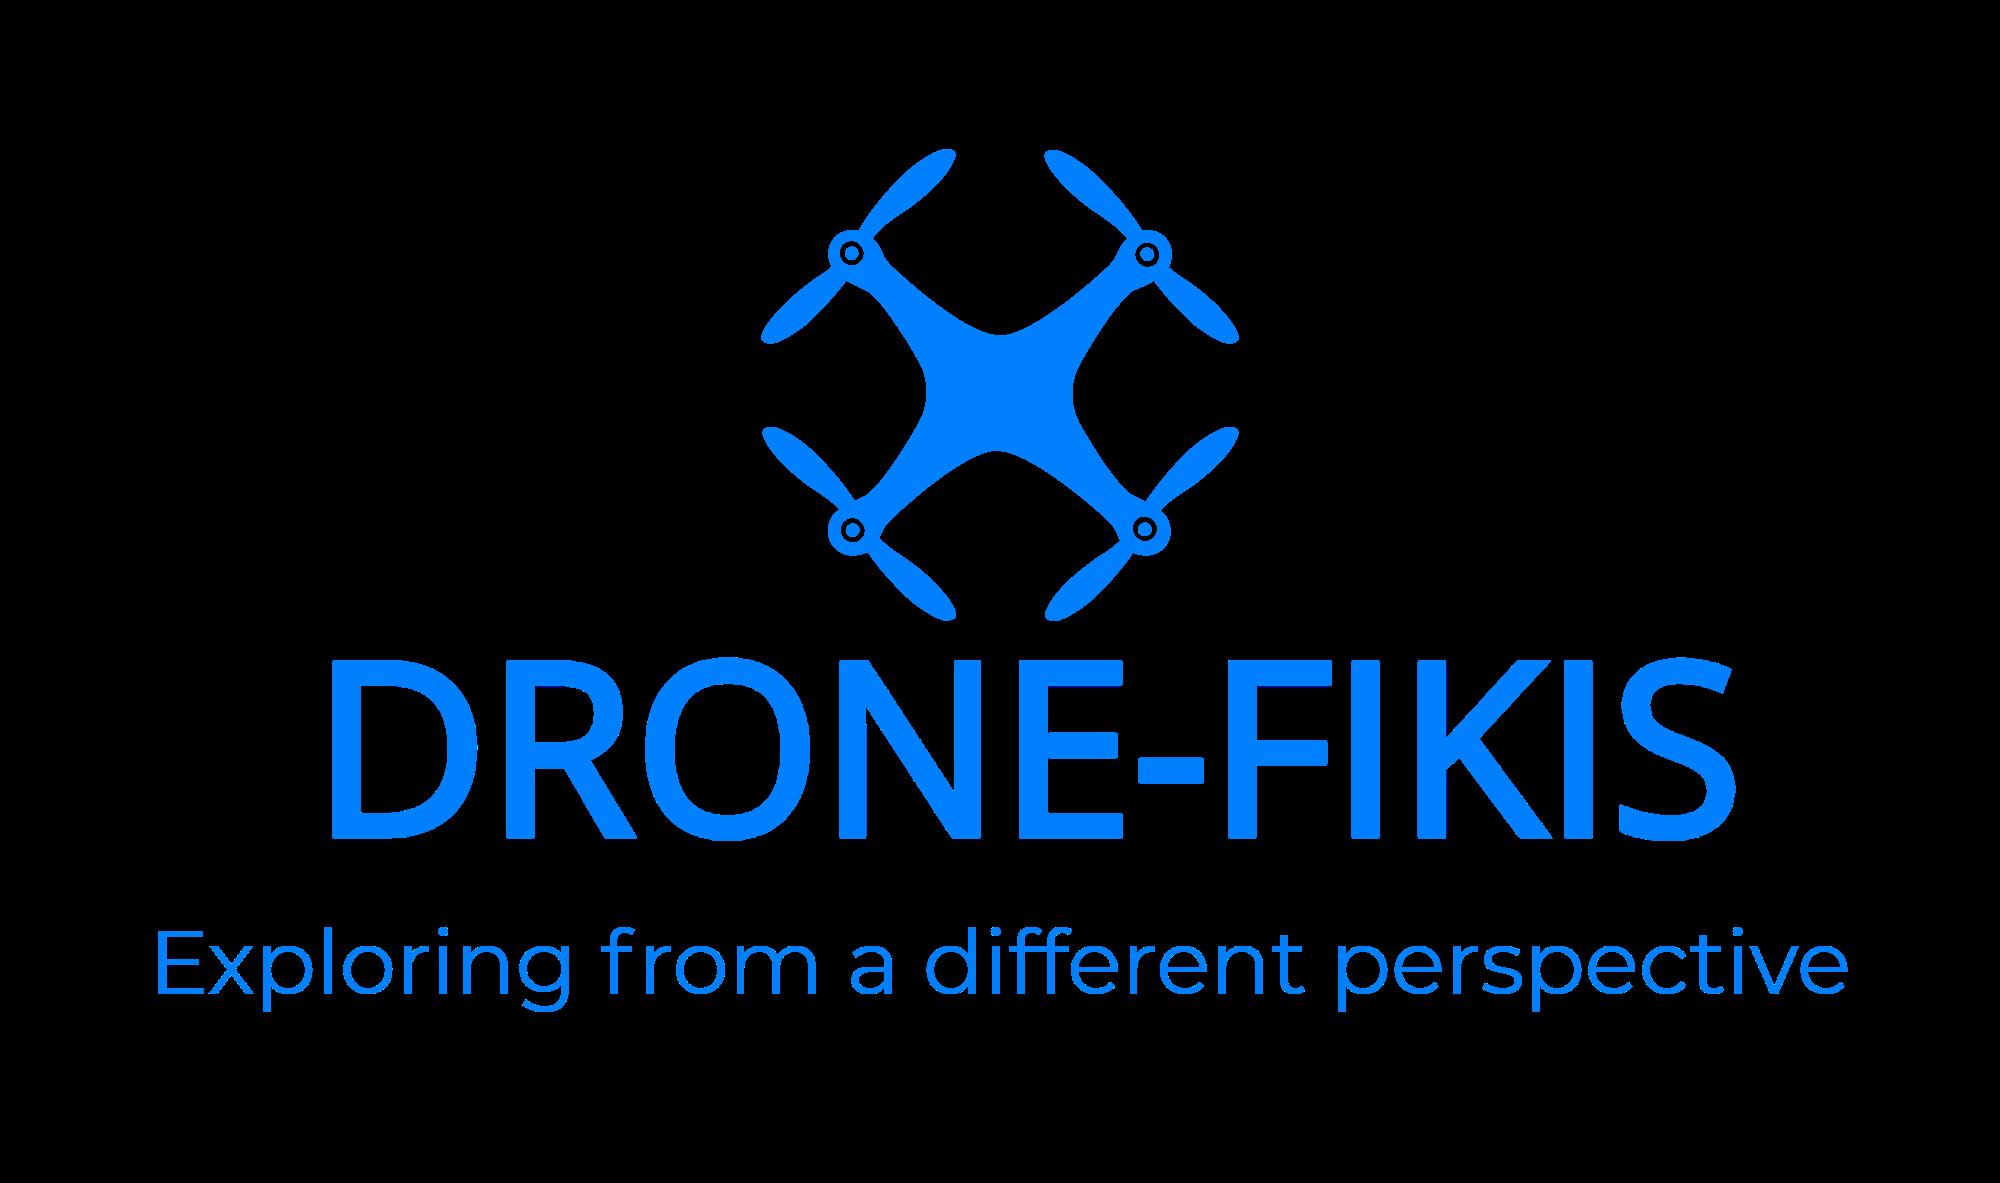 Drone-Fikis